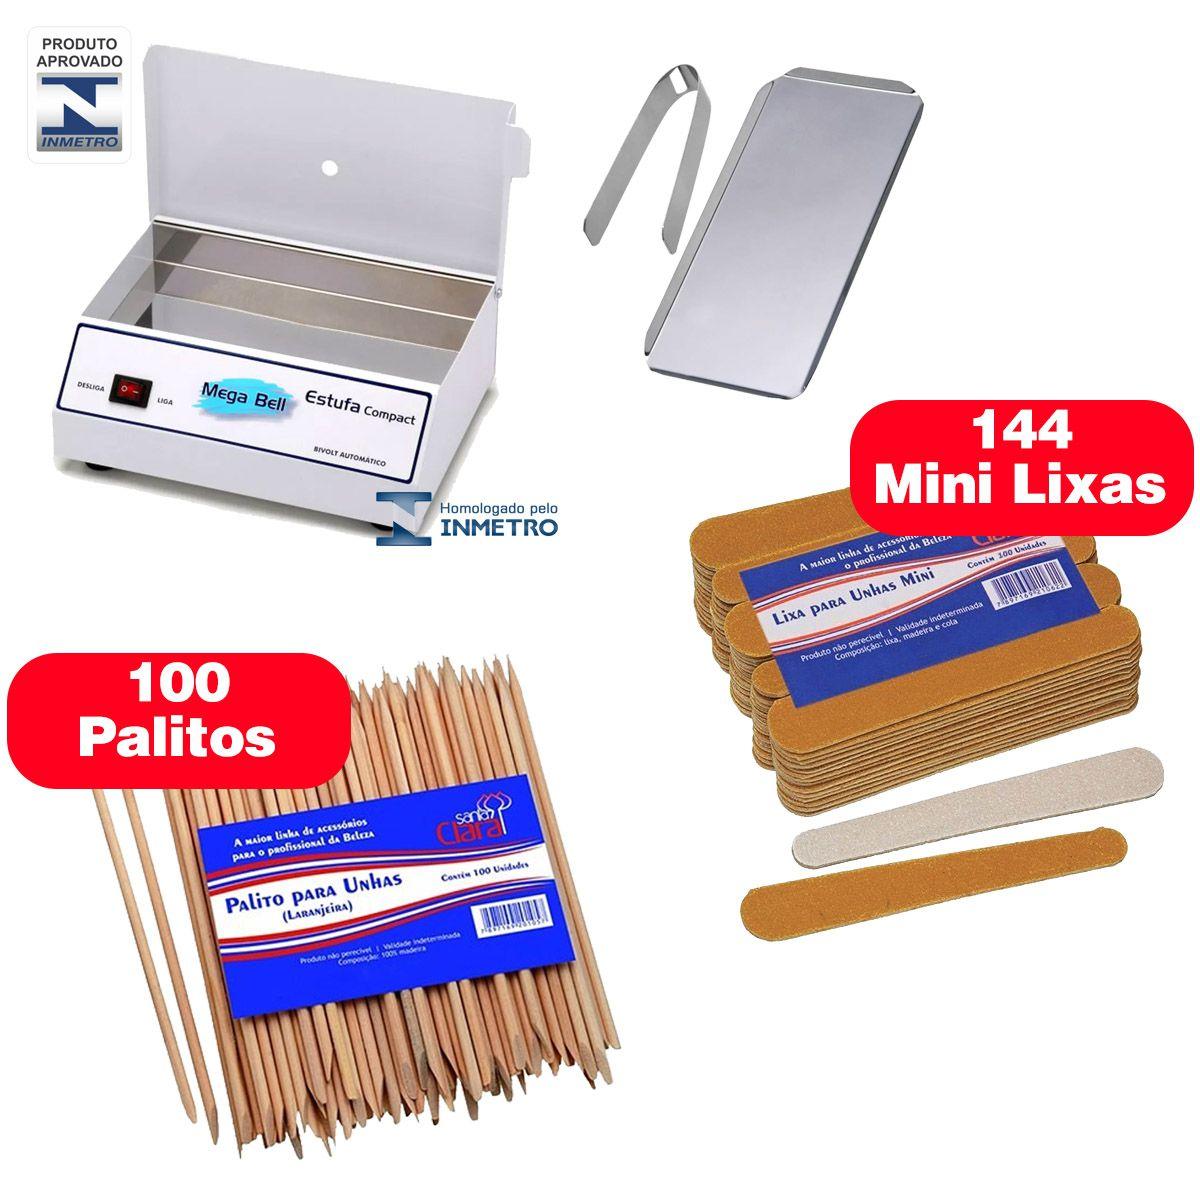 Estufa Manicure + acessorios + 144 mini Lixas + 100 palito